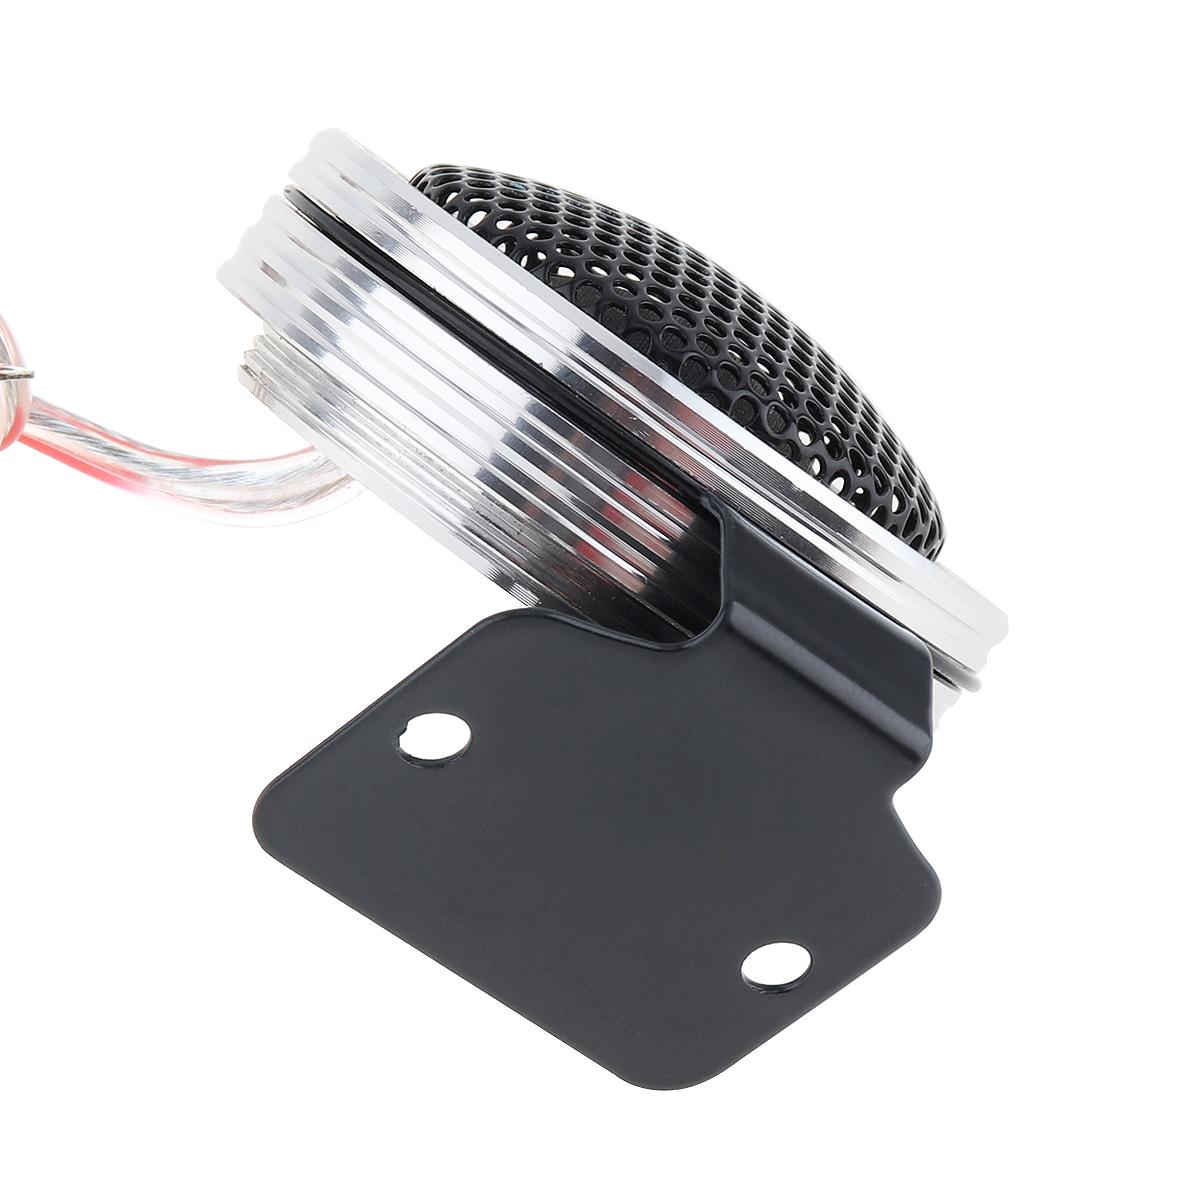 2x YH-T26 150W Mini Dome Car SUV Audio Tweeter Speaker for Car Audio System 12V